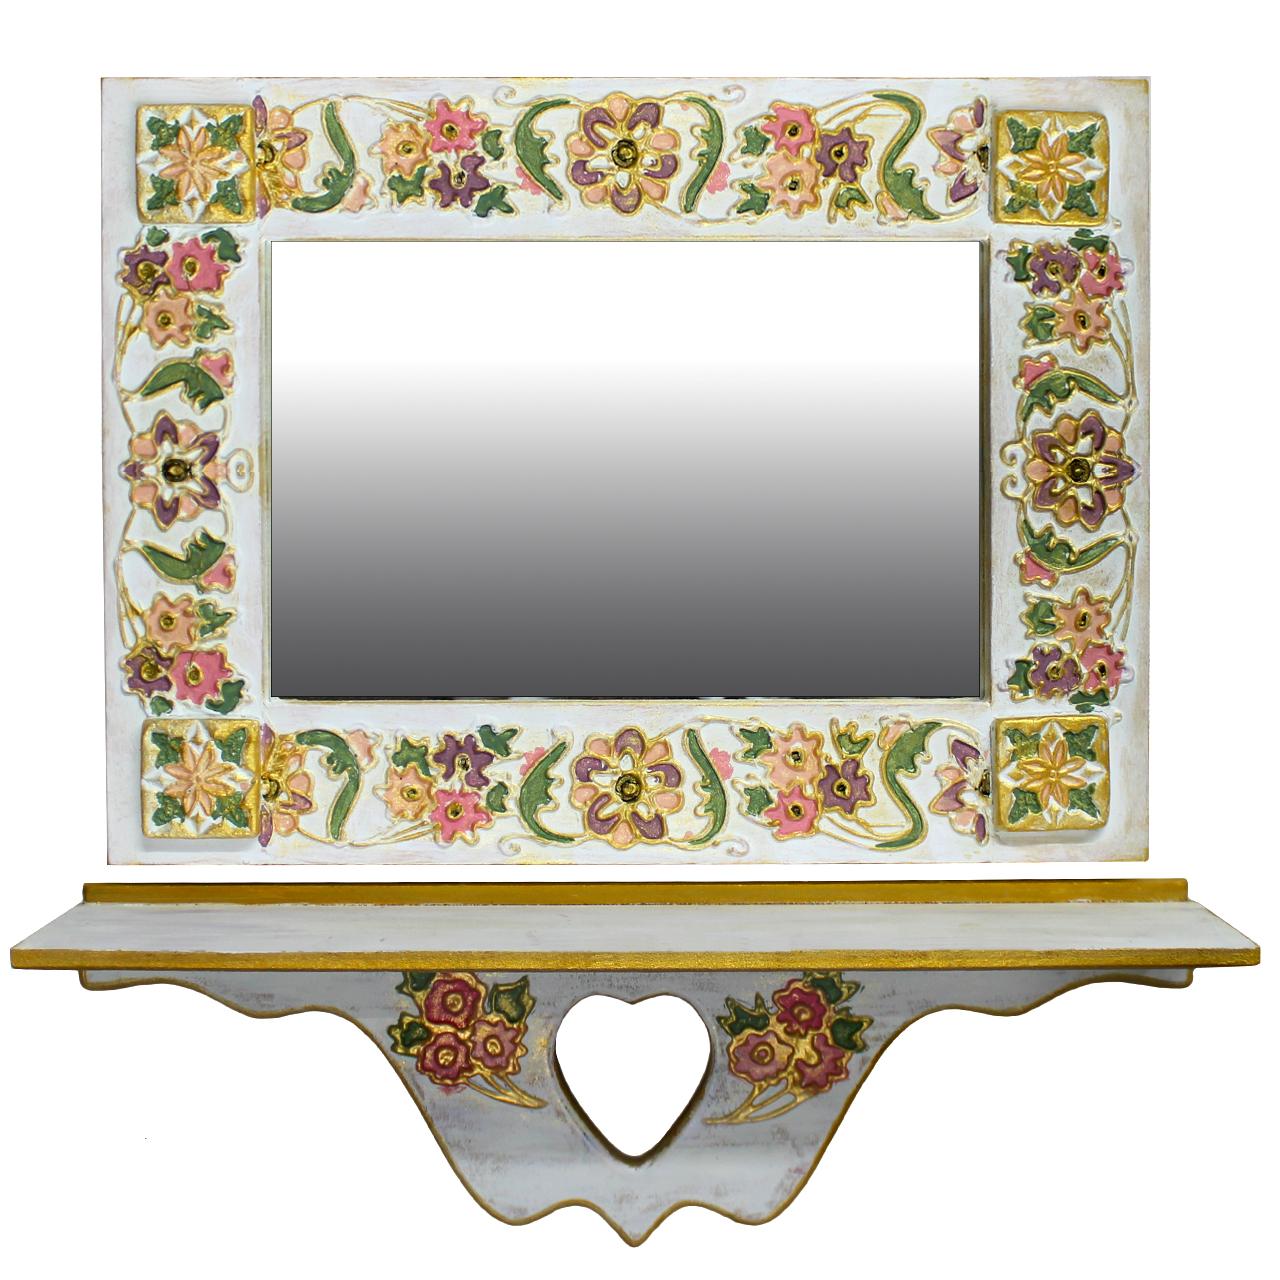 آینه و کنسول دست نگار کد 01-20